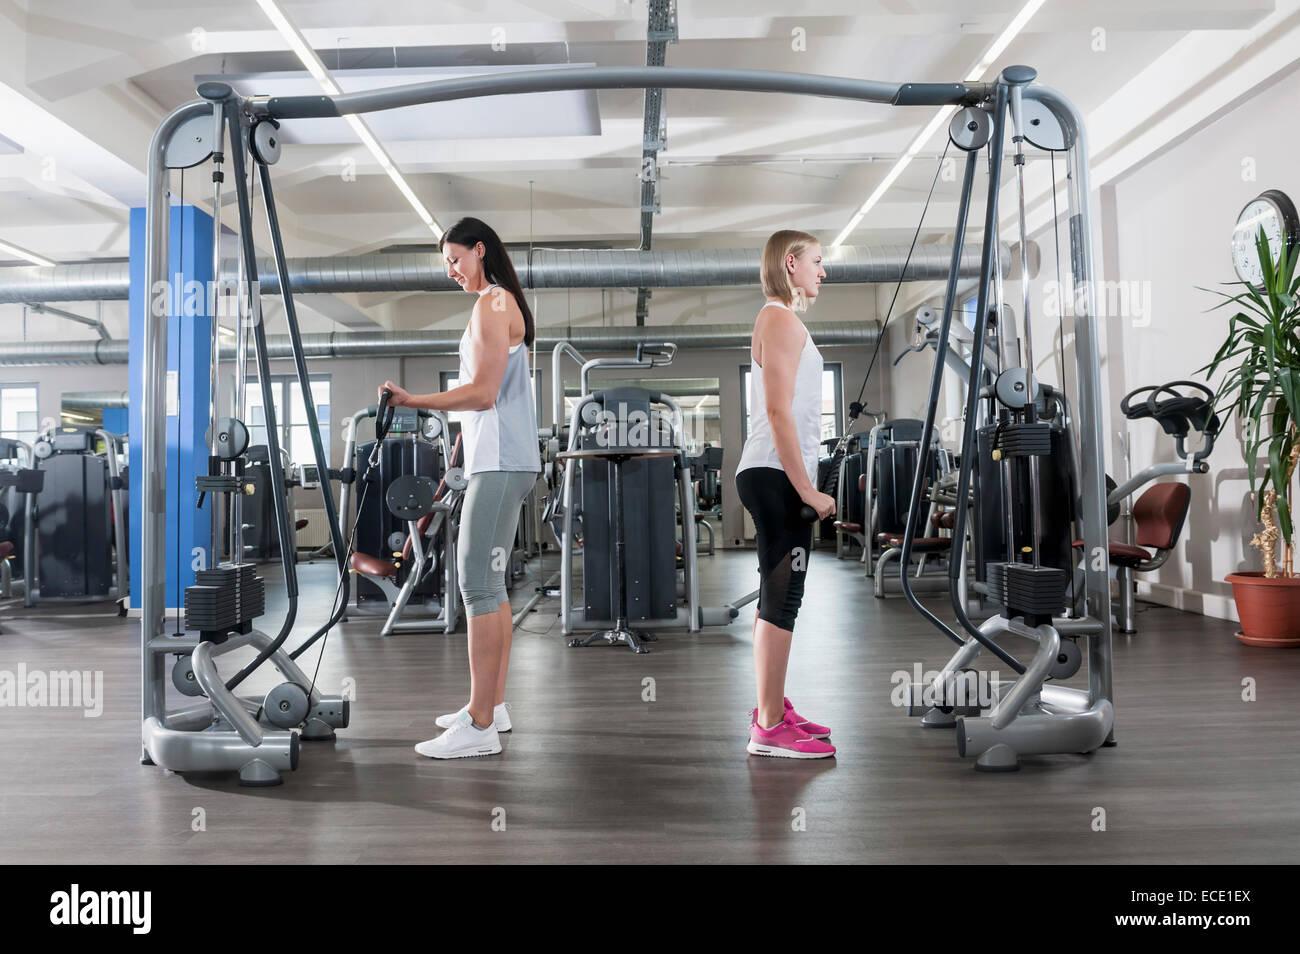 Zwei junge Frauen Fitness Studio Sport praktizieren Stockbild